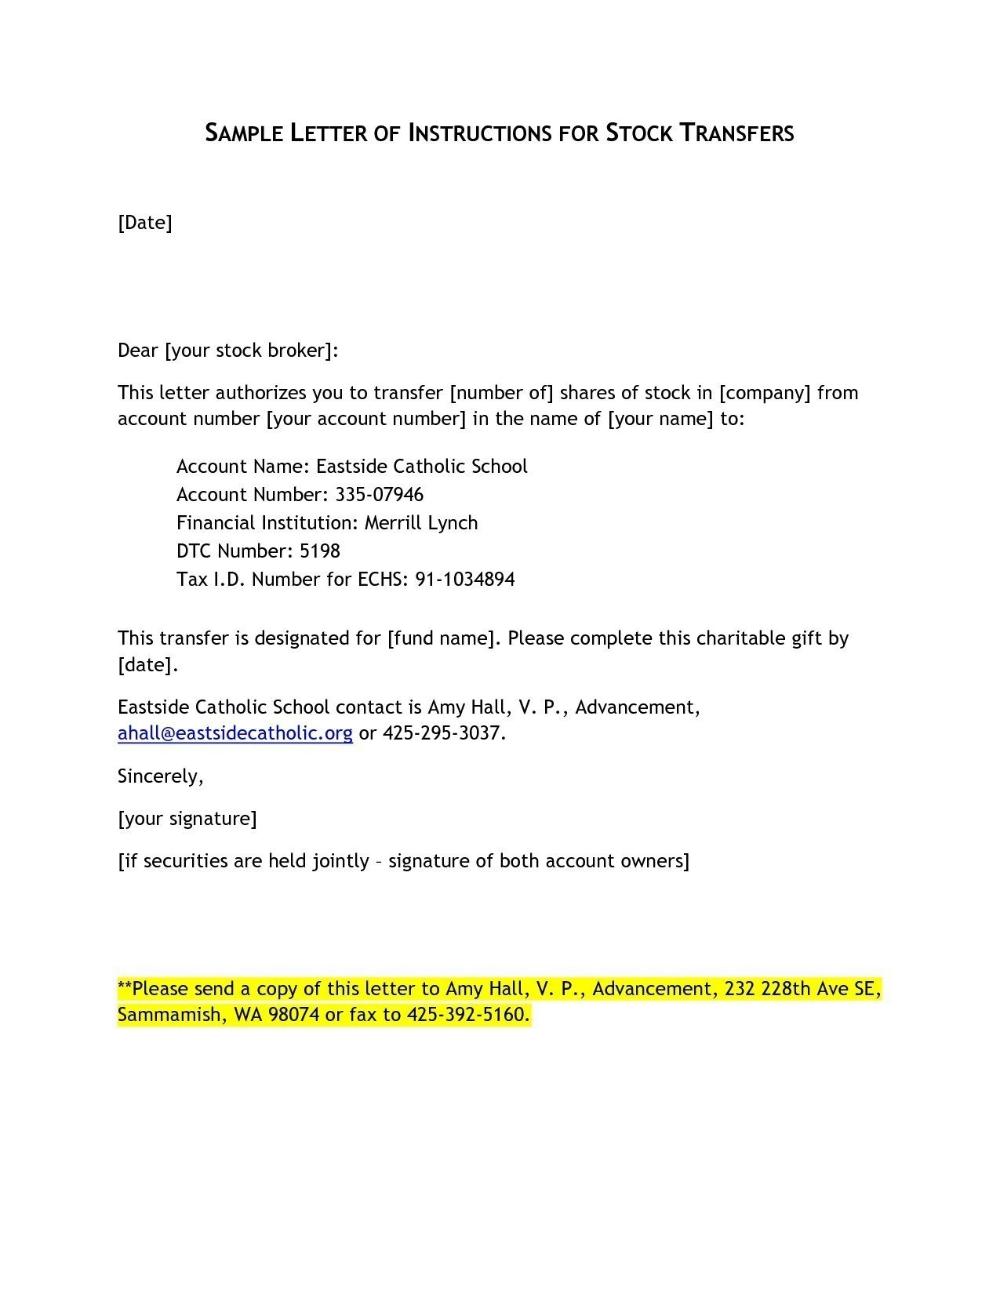 d847d0f41149c2ab94f286bd3083e7e0 - An Application For Transfer Certificate